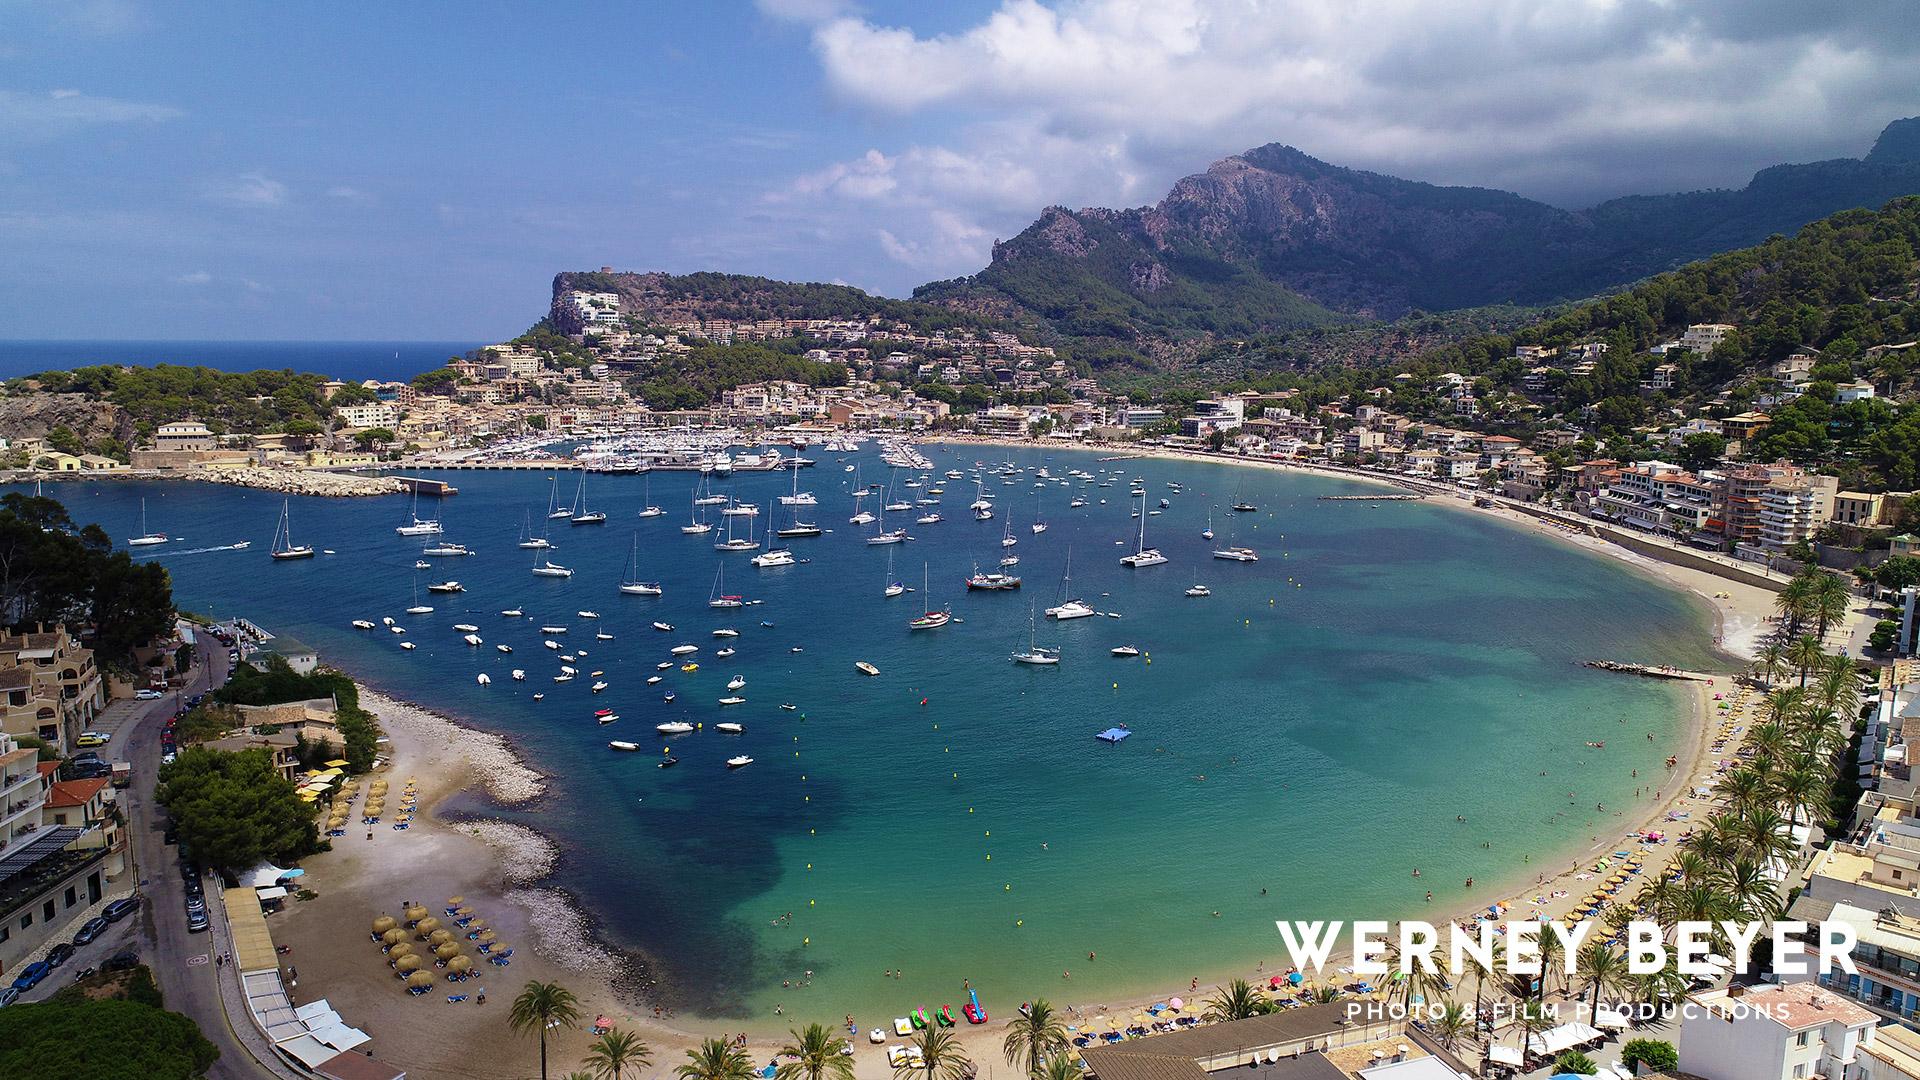 Port de Sóller, Majorca, Balearic Islands, Spain